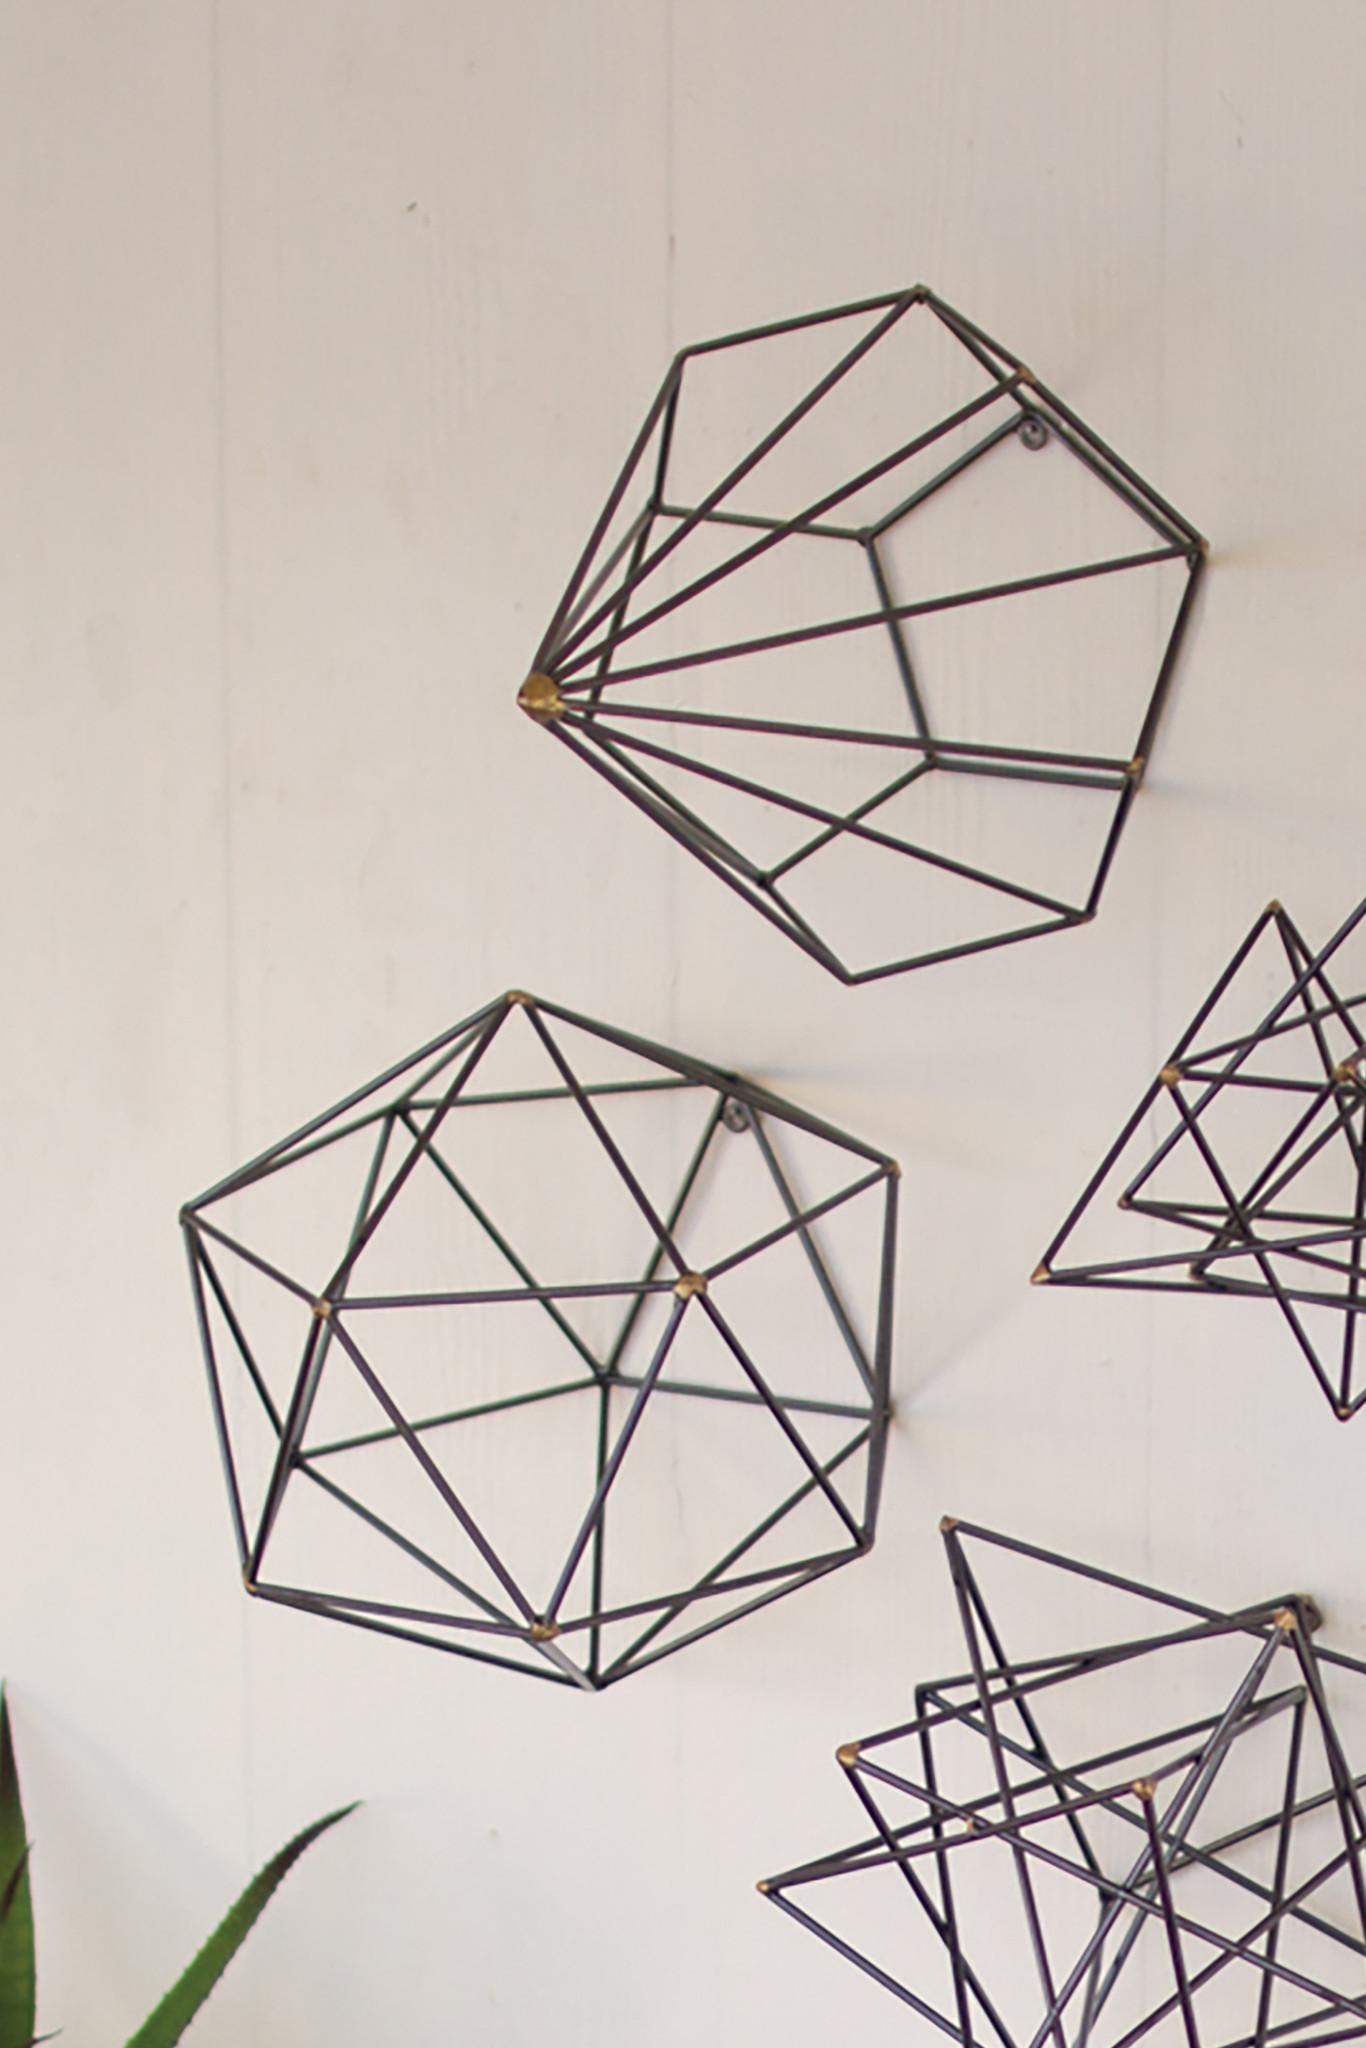 Geometric Metal Wall Art Amazing Wall Art Decals For Target Wall in Target Metal Wall Art